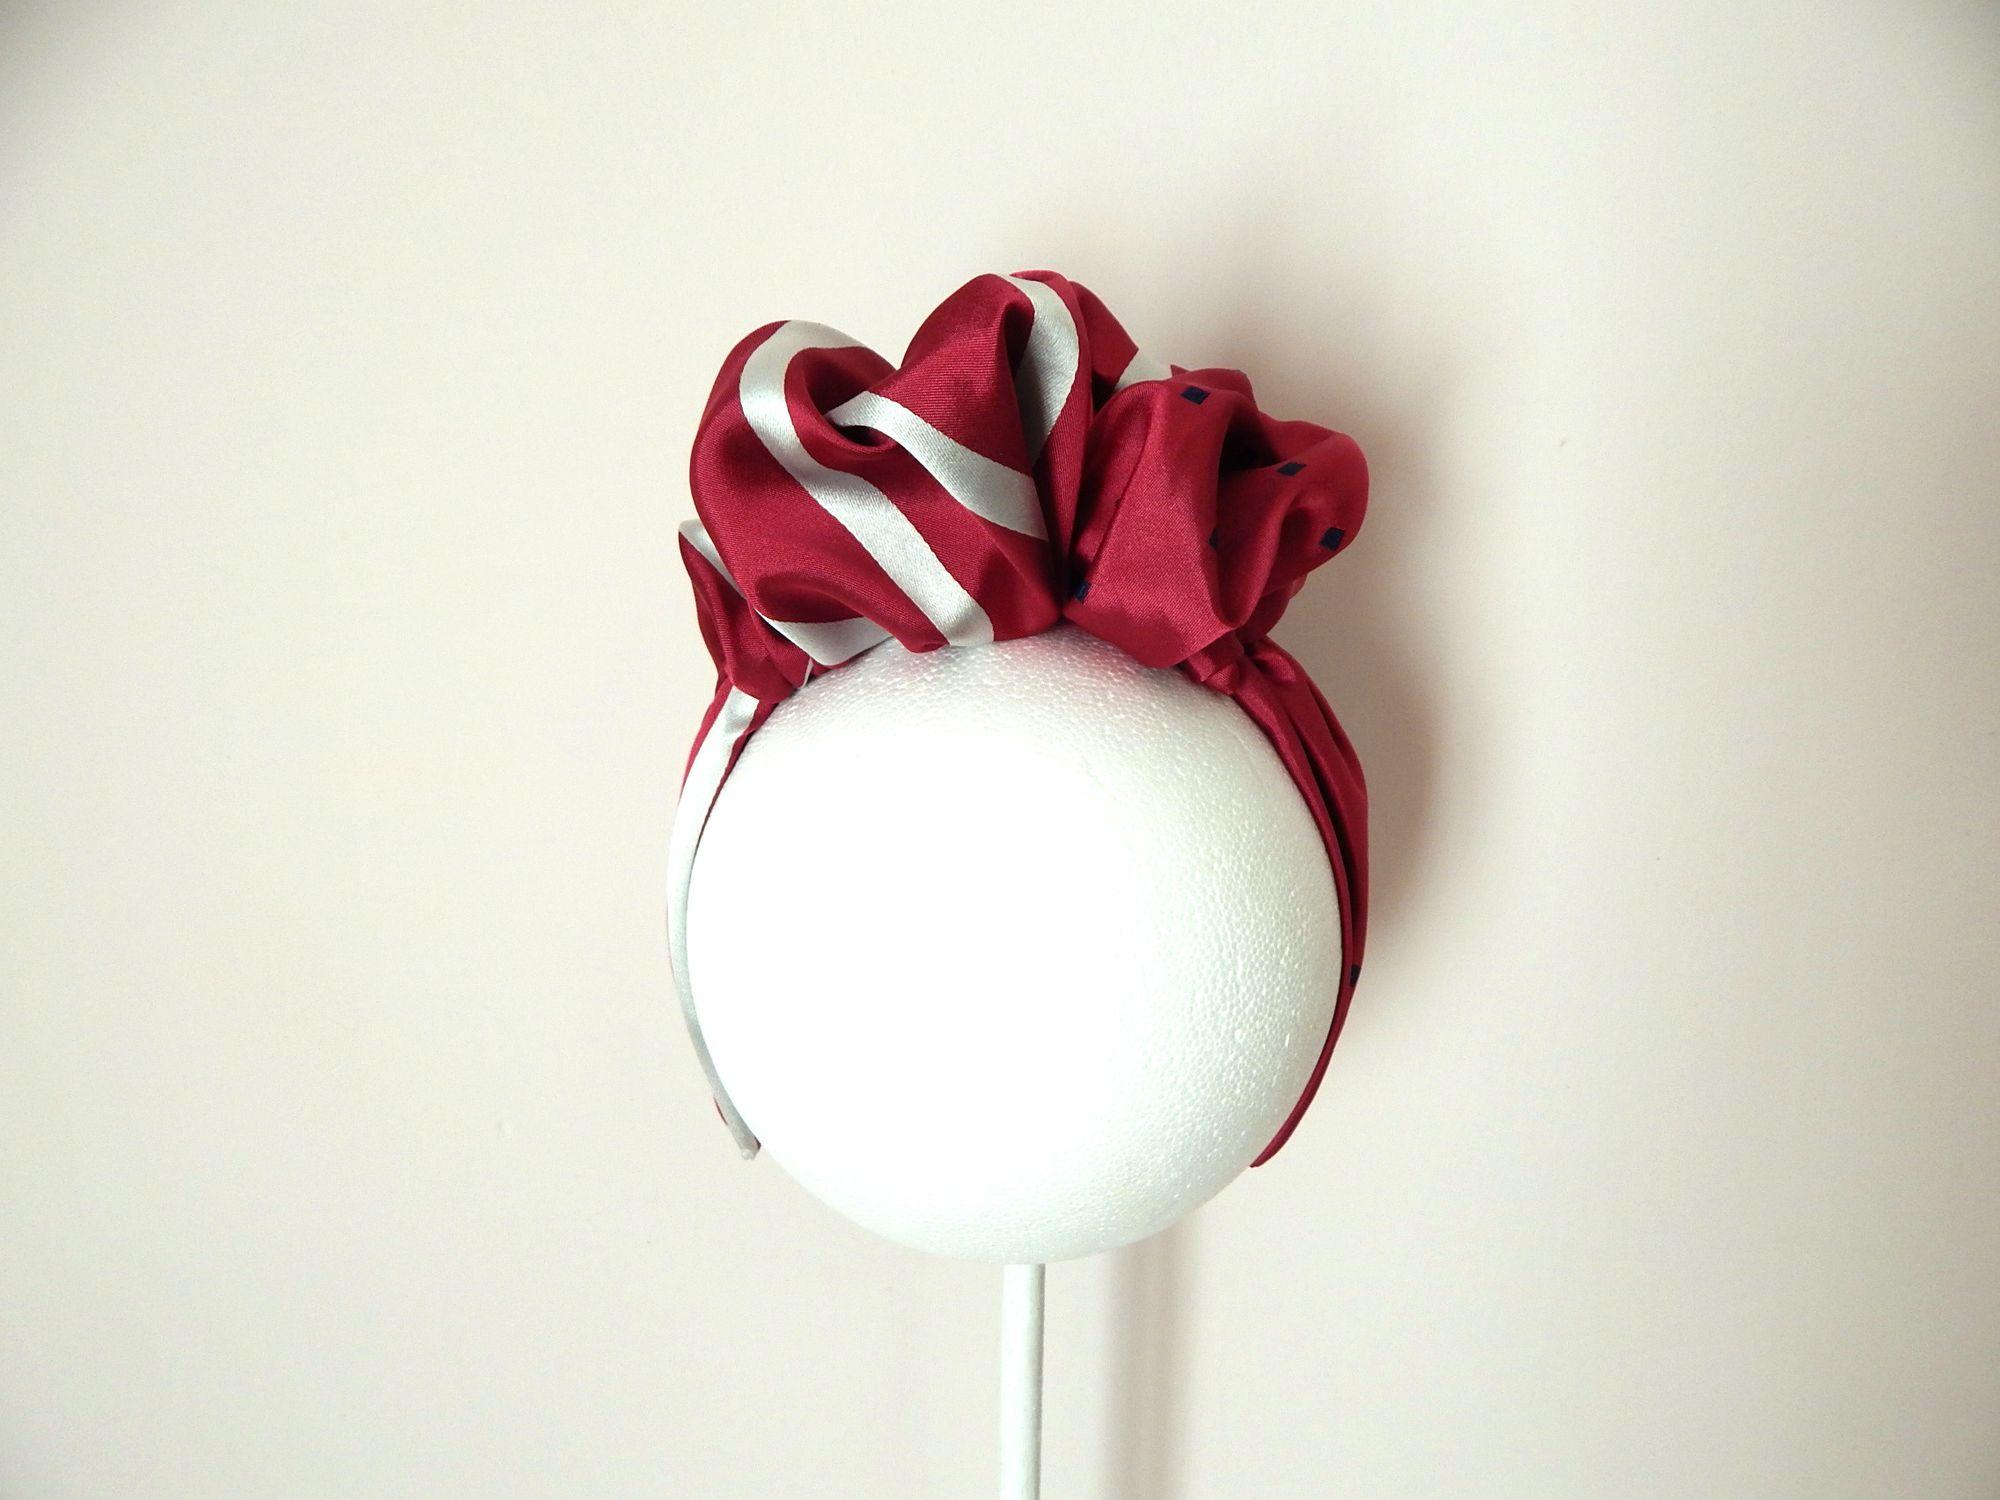 http://lanicodellemeraviglie.tictail.com/product/cerchietto-turban-rouches-diverse-fantasie